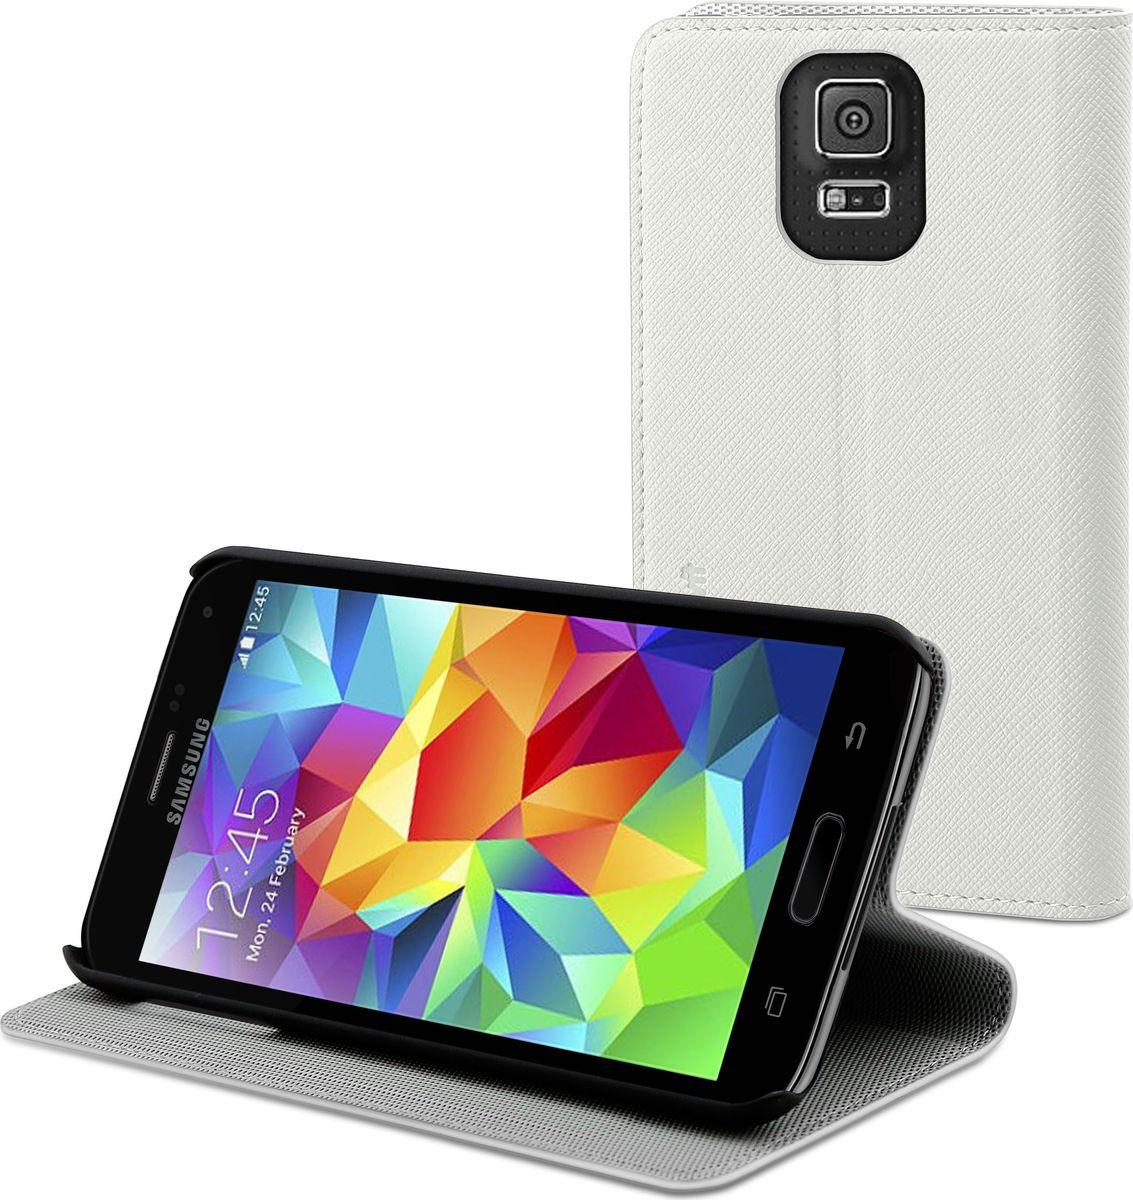 Чехол для сотового телефона Muvit Slim Folio Stand Case для Samsung Galaxy S5 бел,, MUSNS0047, белый все цены